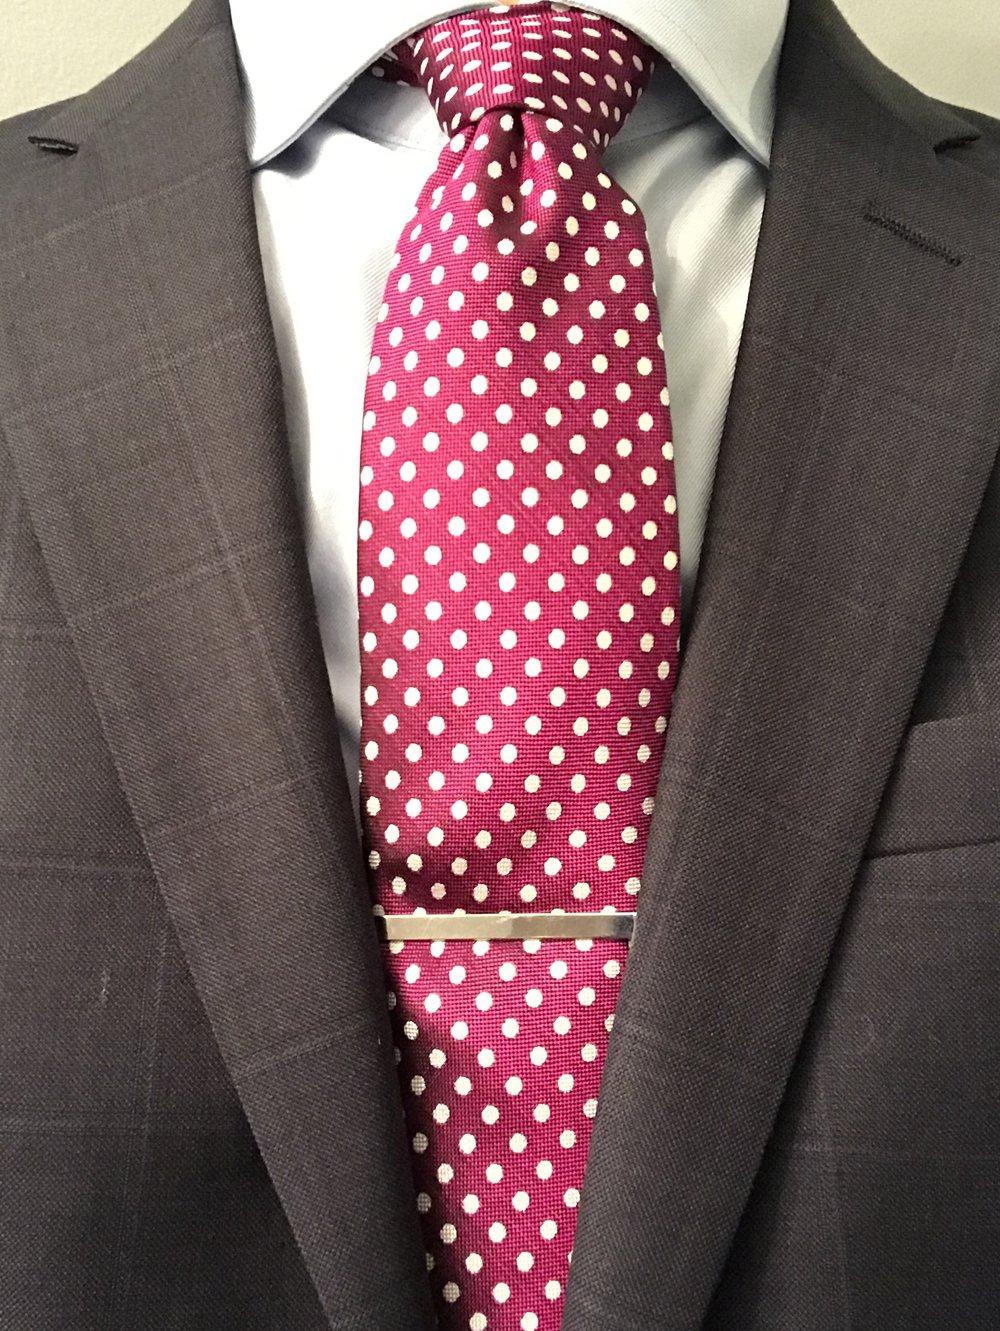 Charles Tyrwhitt magenta and white silk classic Oxford spot tie